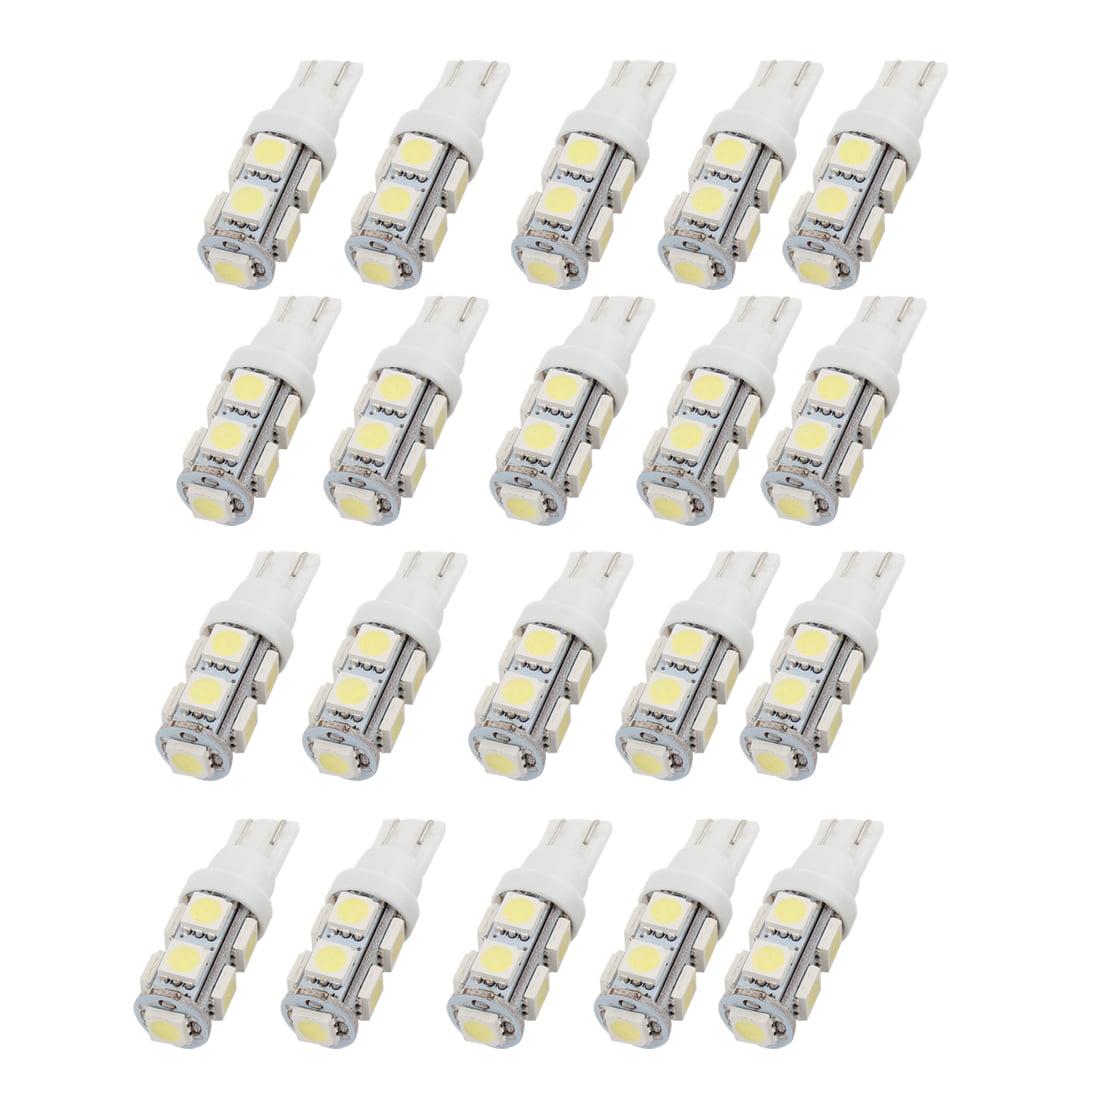 Unique Bargains White T10 194 192 168 W5W 5050 SMD 9 LEDs Bulbs Interior Side Wedge Light 20PCS